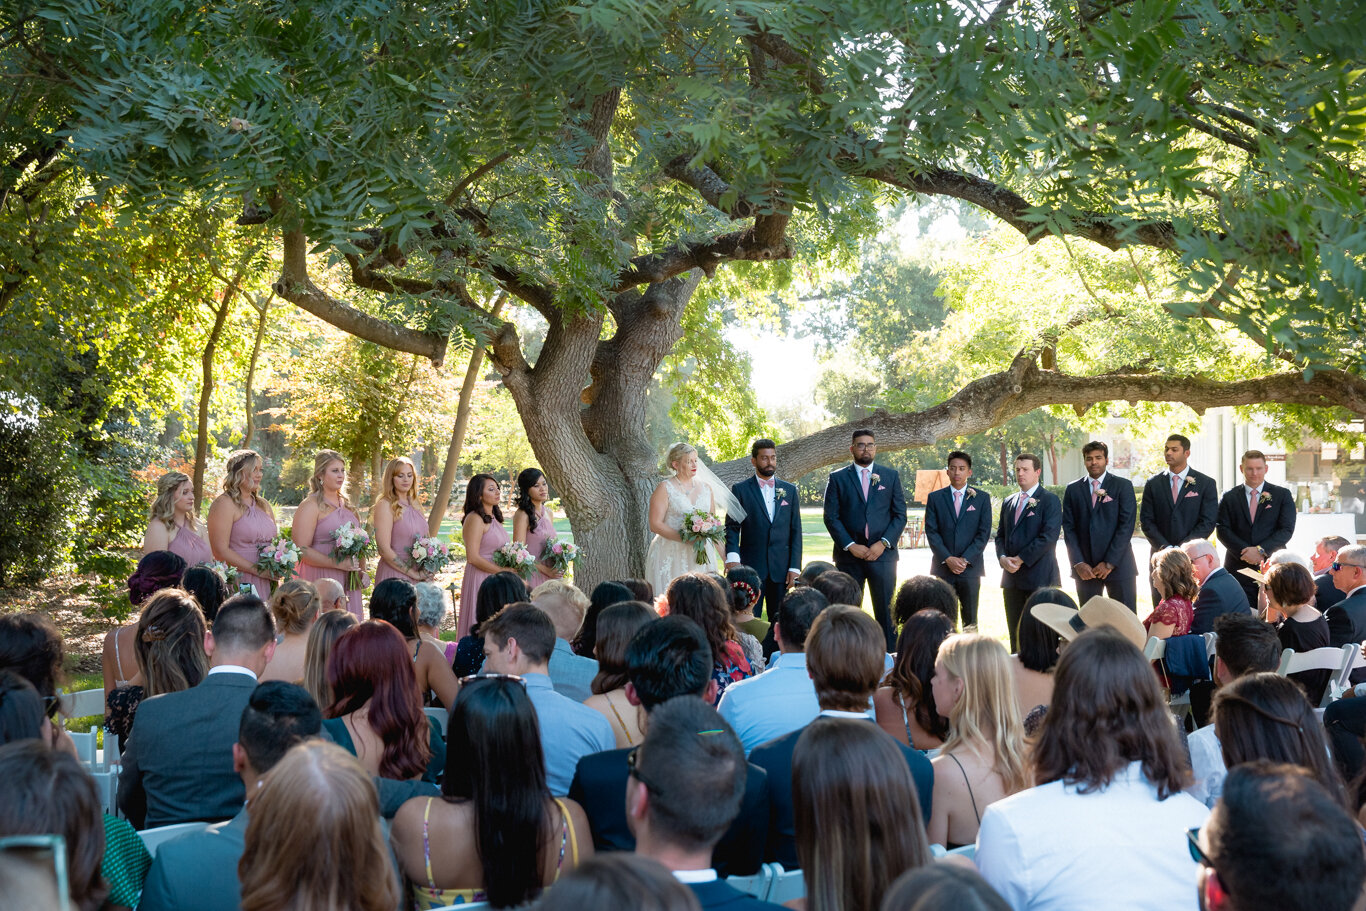 2019.08.24_Emily-Ashir-Wedding-at-the-Maples-5811.jpg